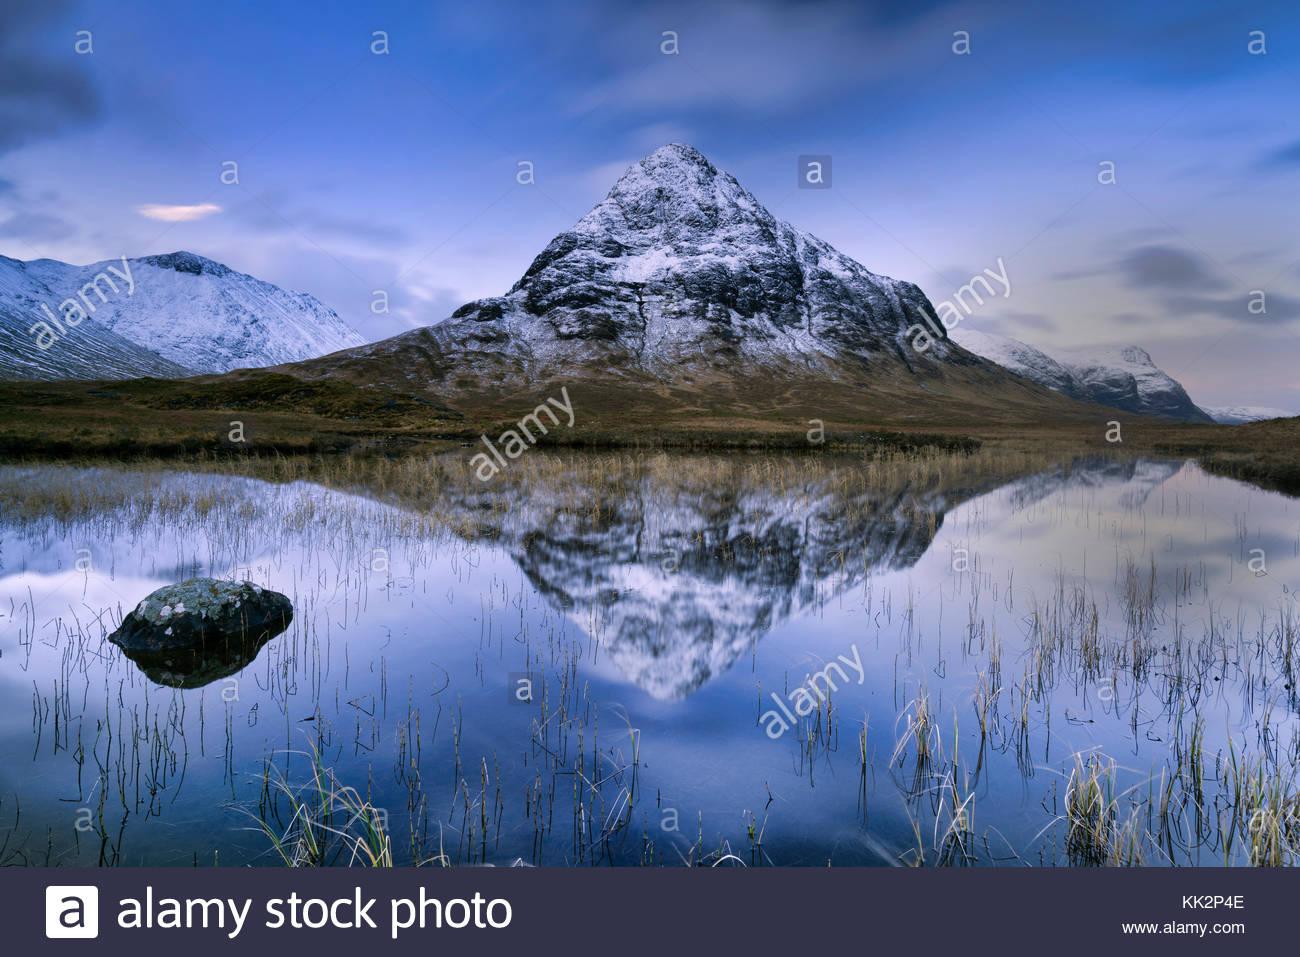 Buachaille Etive Mòr, Scotland, UK. 28th November, 2017. Dawn breaking over Buachaille Etive Mòr Scotland - Stock Image